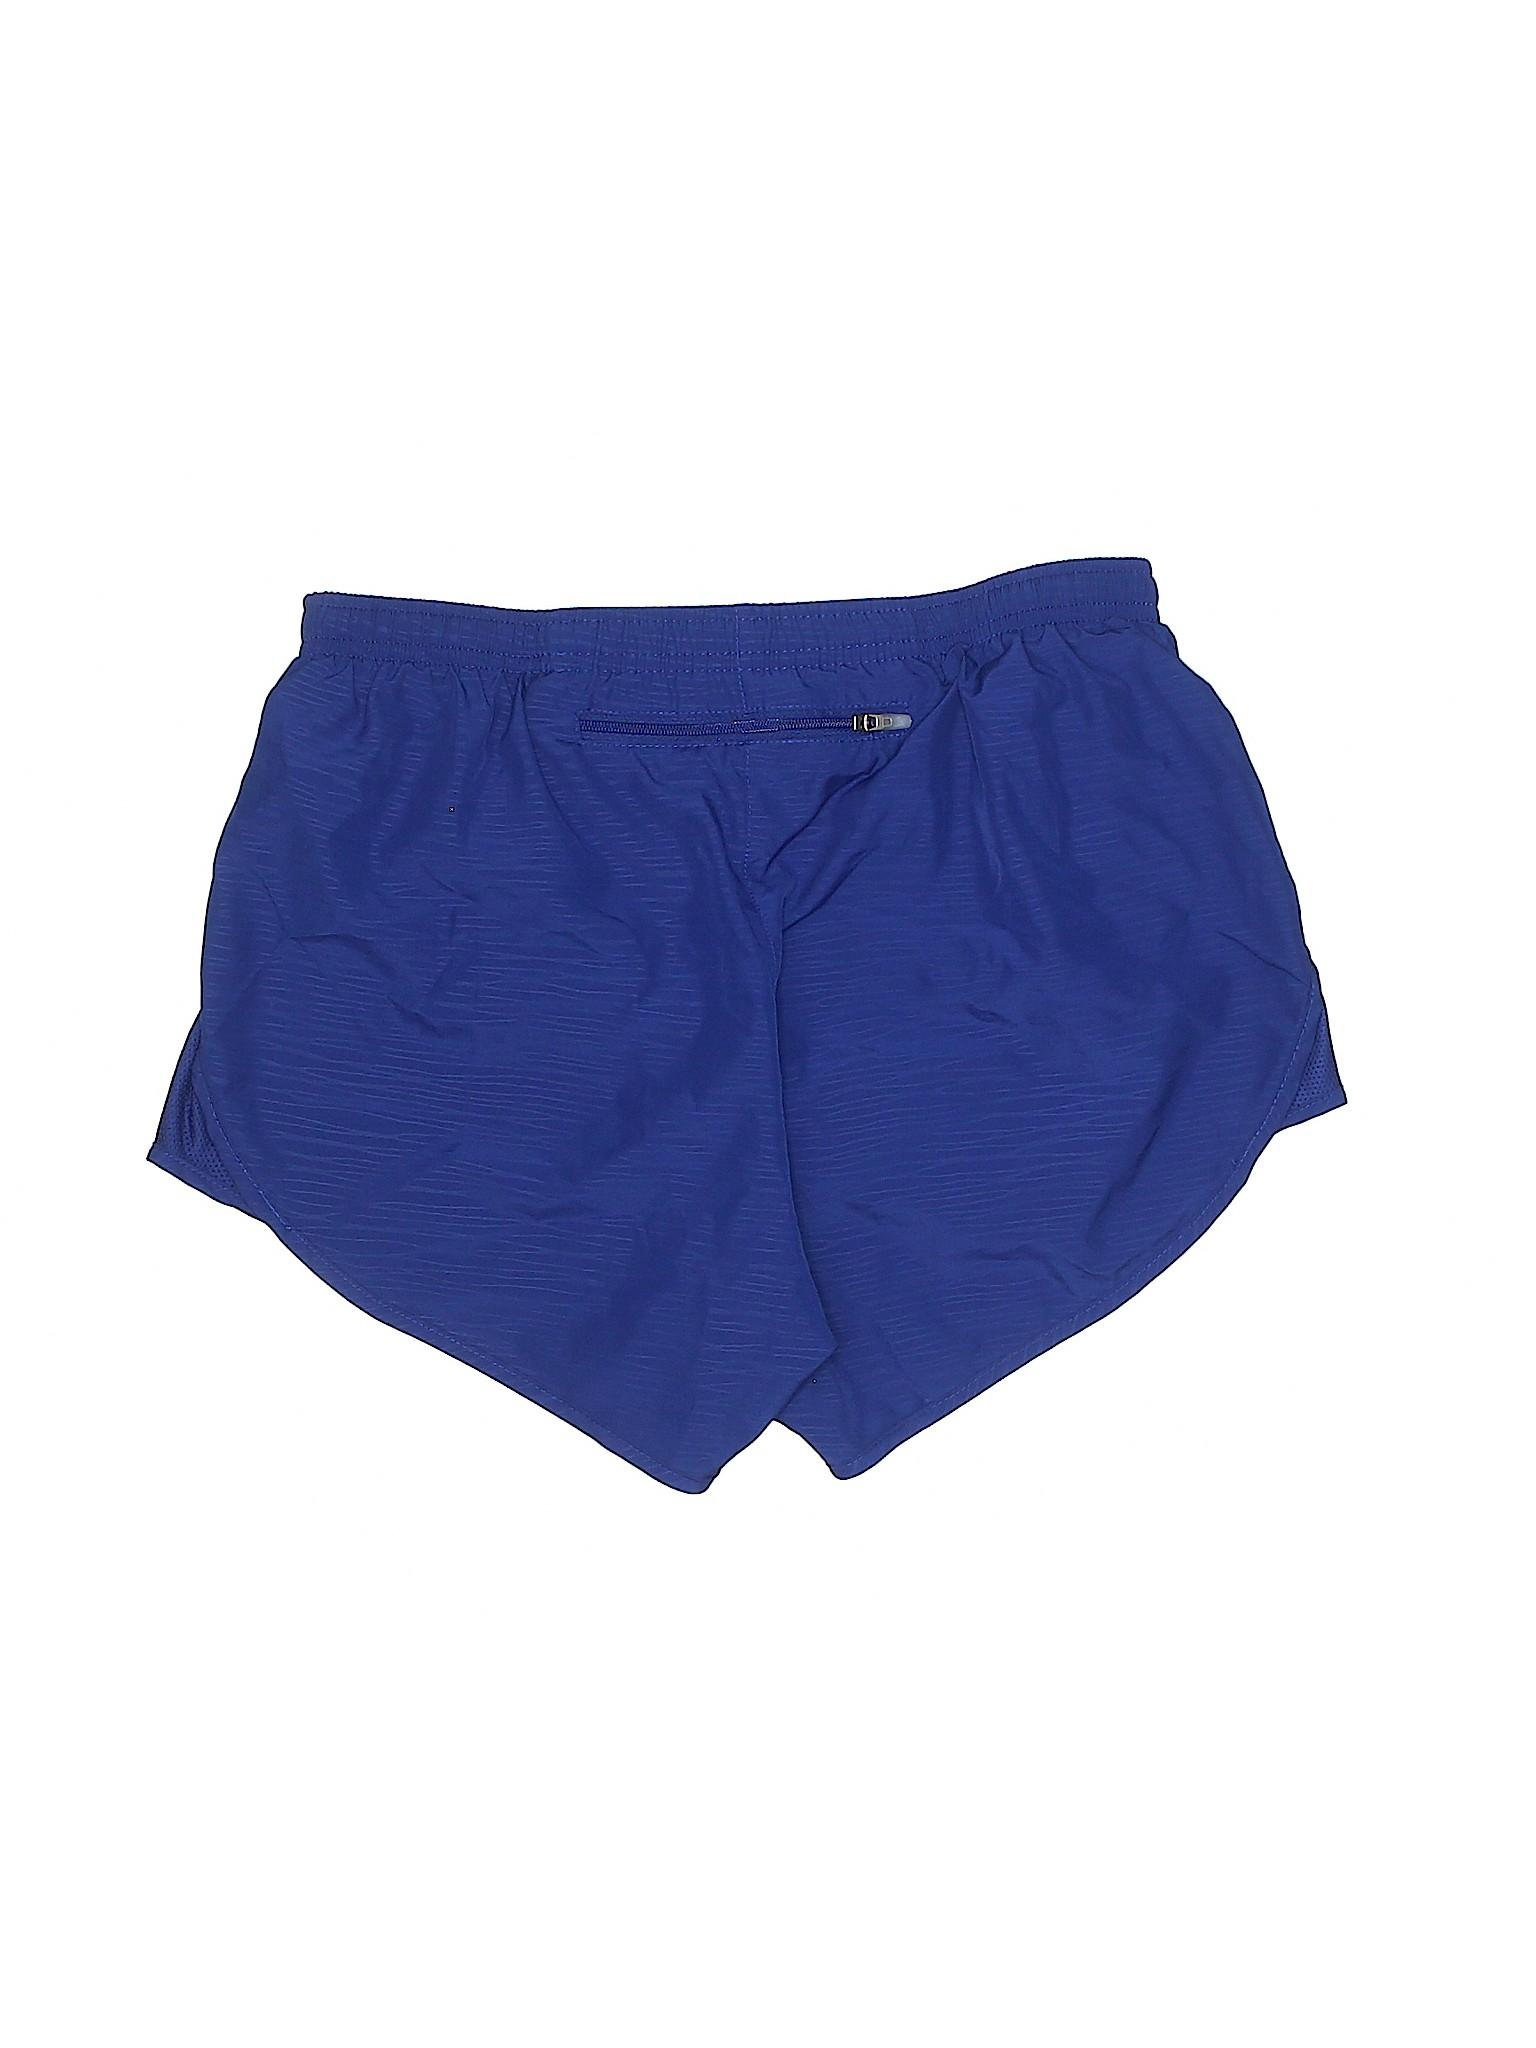 Boutique Boutique Athletic leisure leisure Shorts Nike Athletic Nike Shorts wwIgq7vp